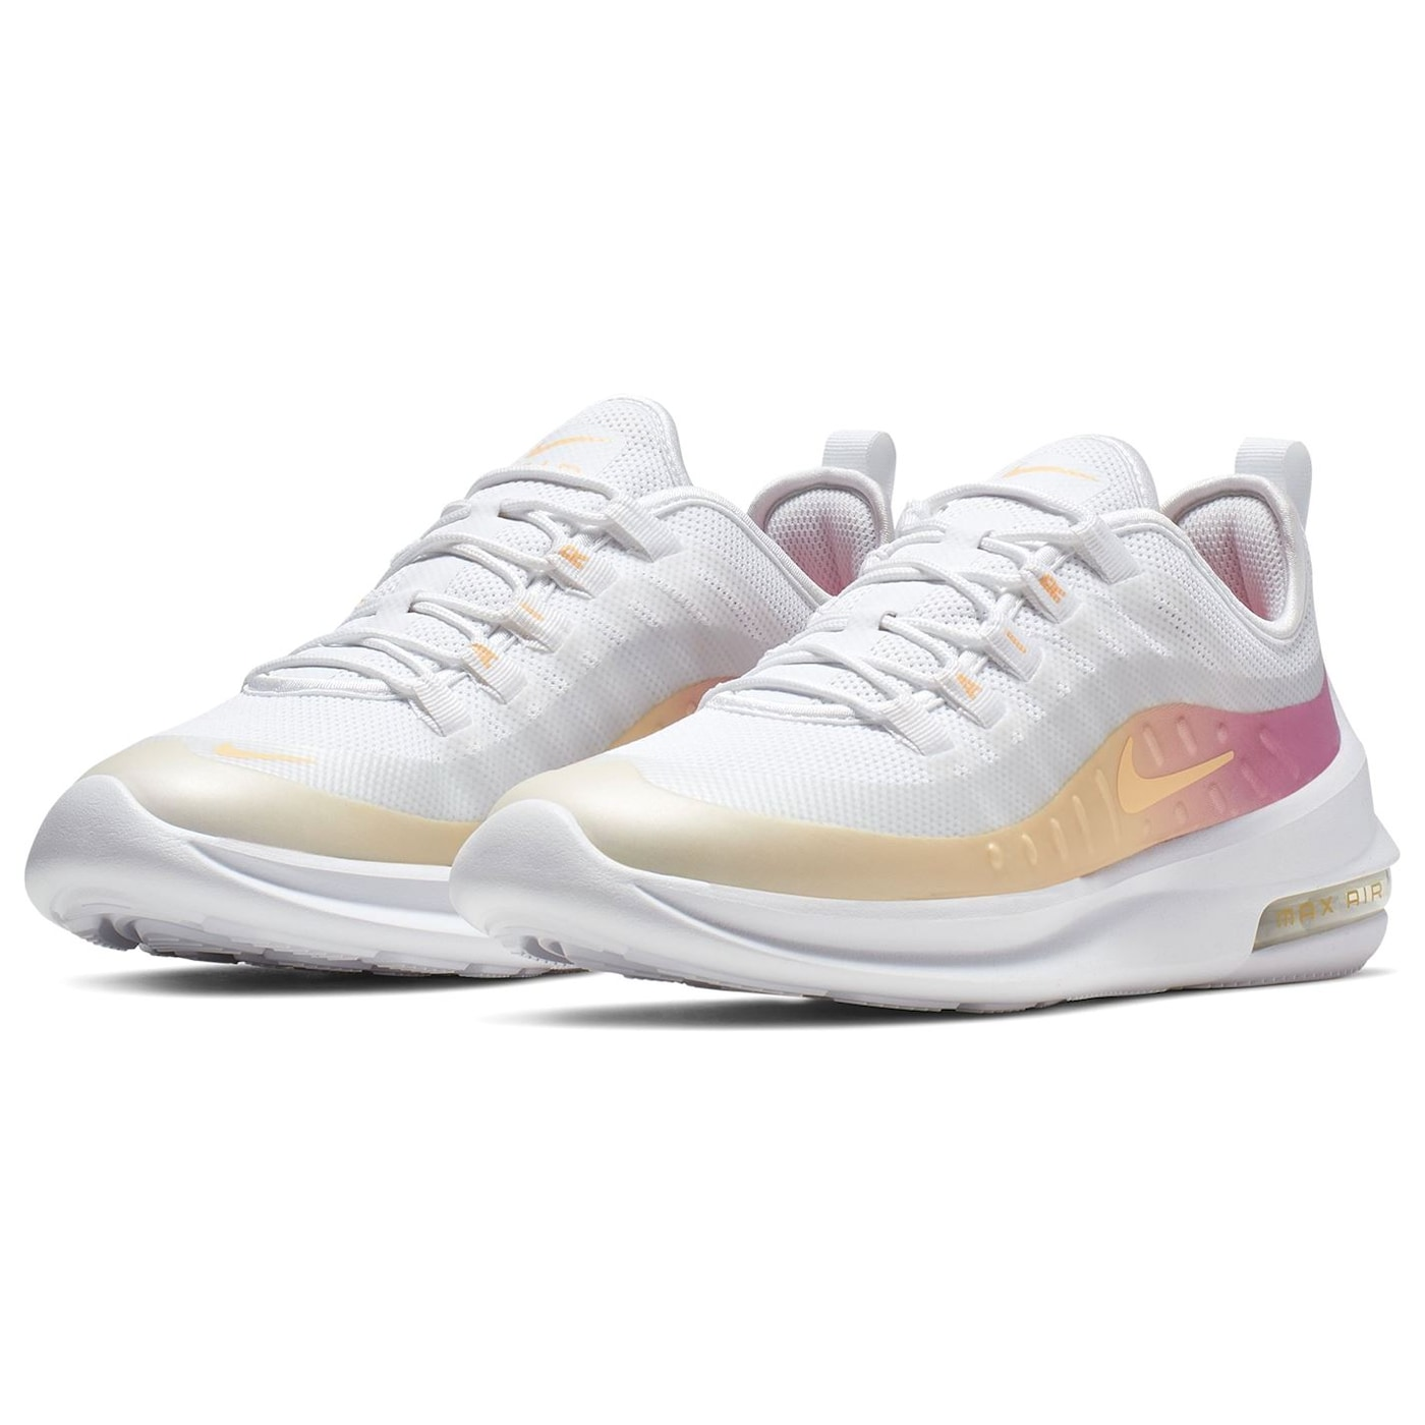 Nike Air Max Axis Premier dámske tenisky